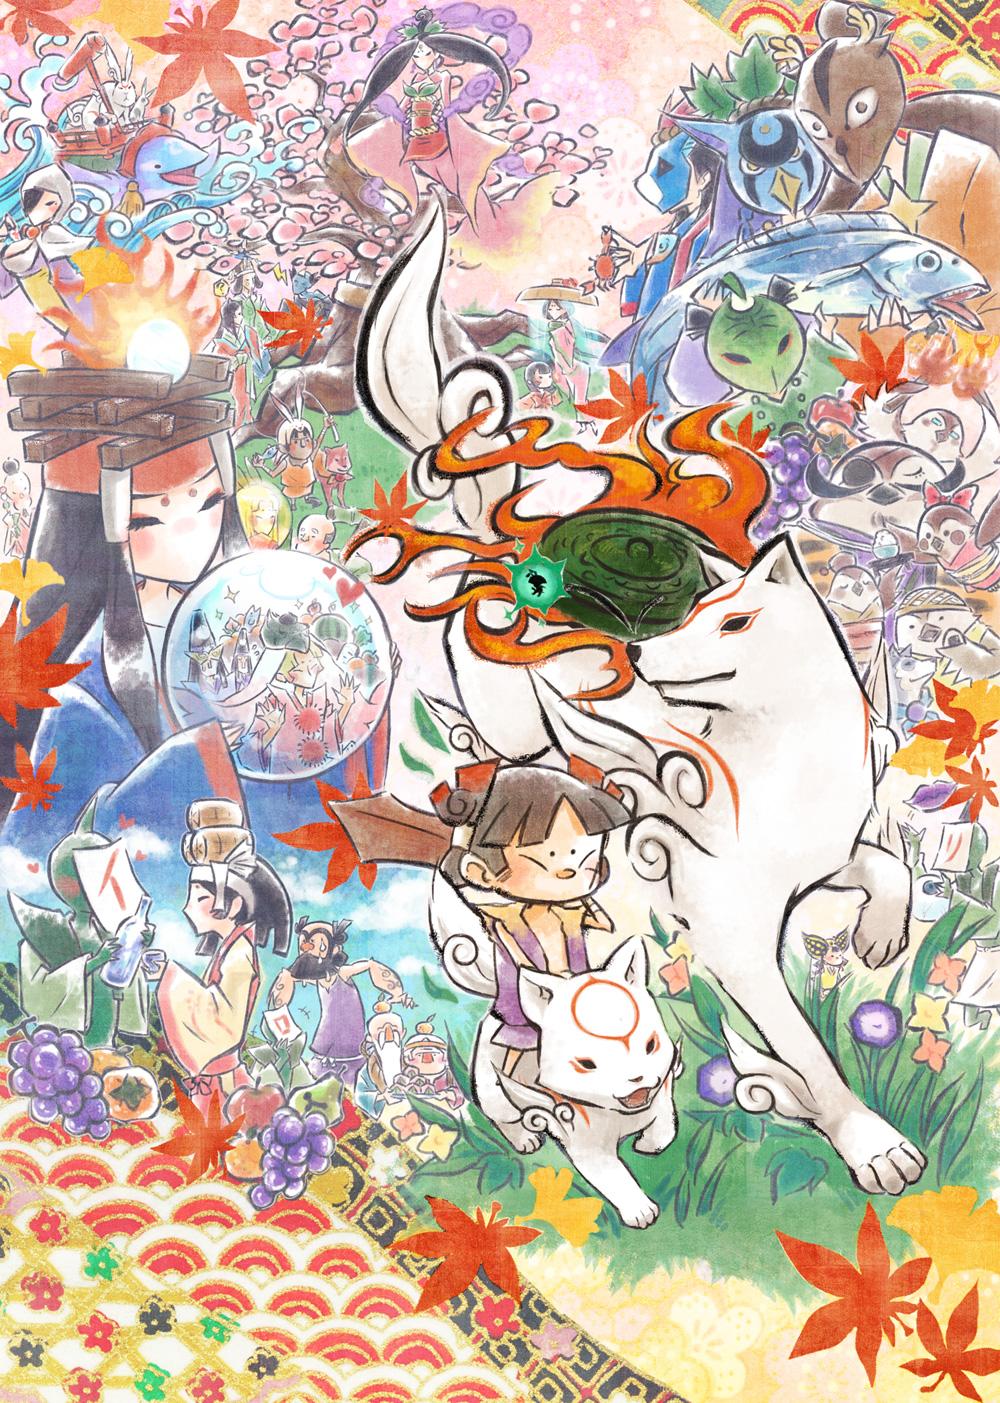 Anime Sword Wallpaper Okikurumi Okami Zerochan Anime Image Board